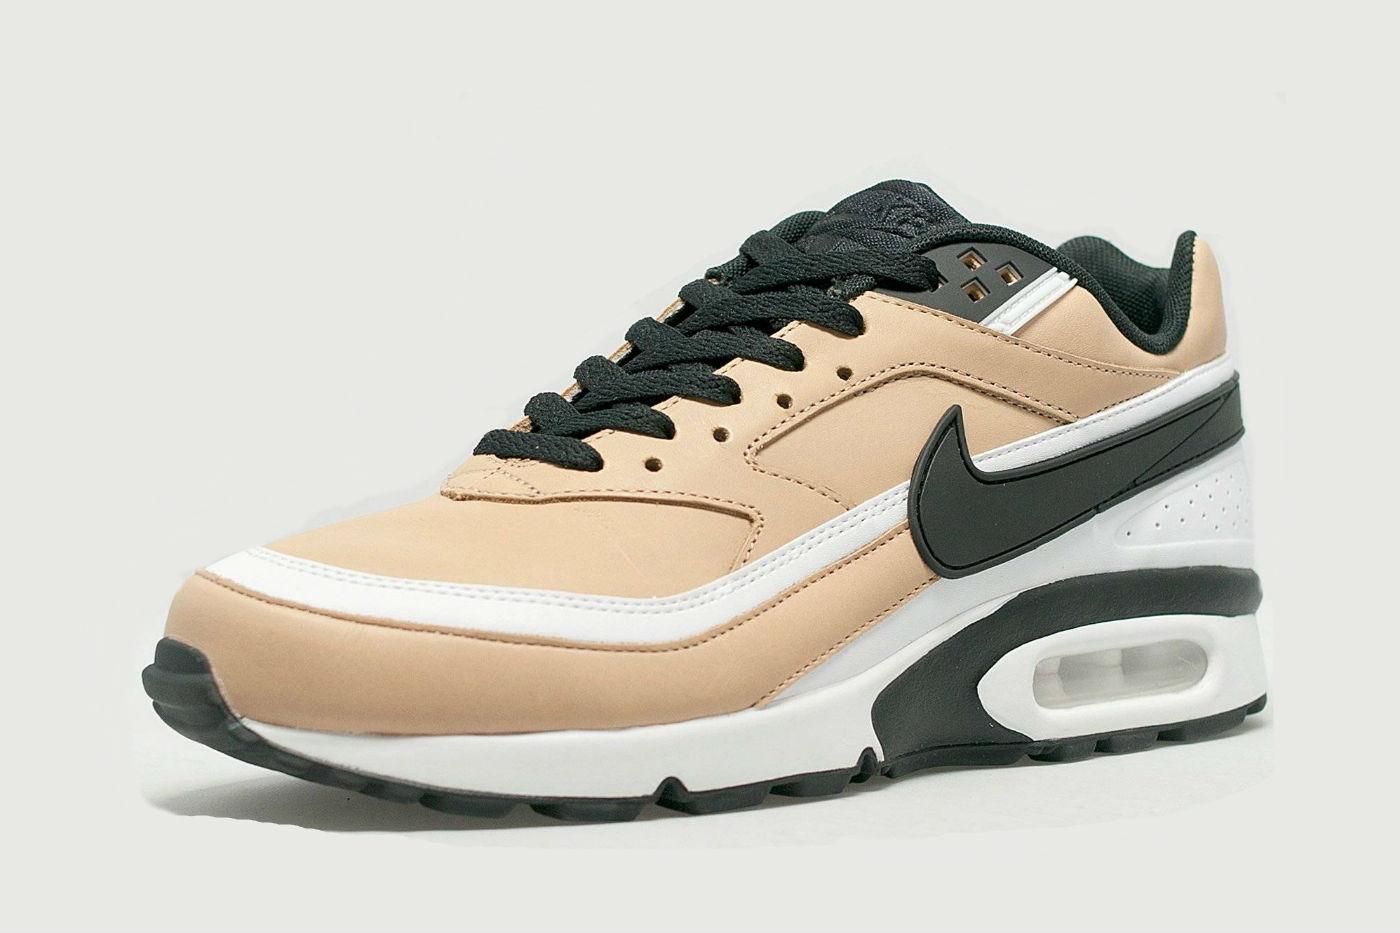 Nike Air Max BW Premium – Vachetta Tan | #SNKR Releases